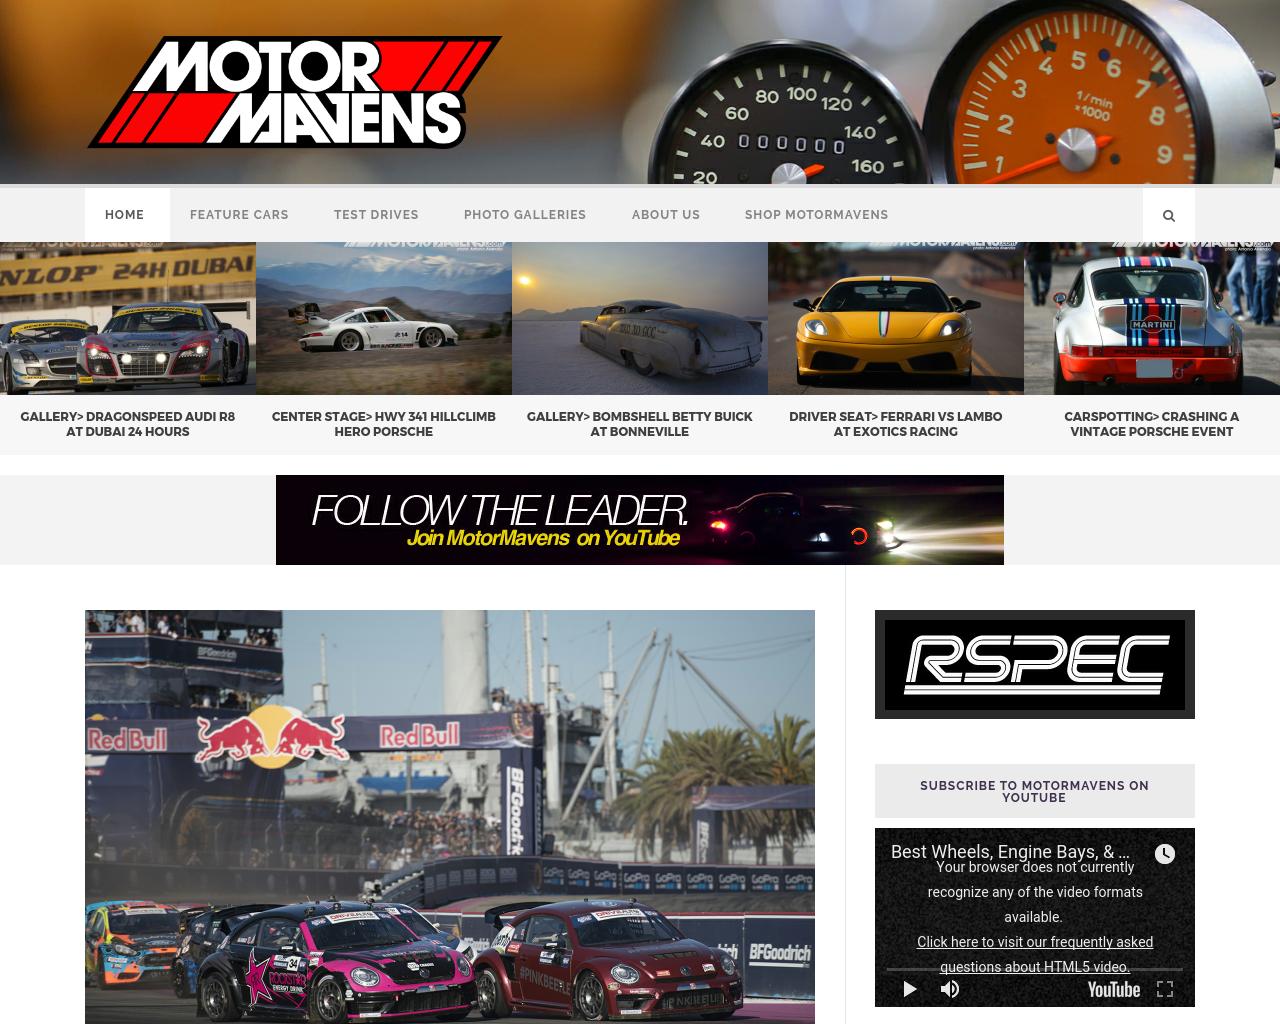 Motor-Mavens-Advertising-Reviews-Pricing